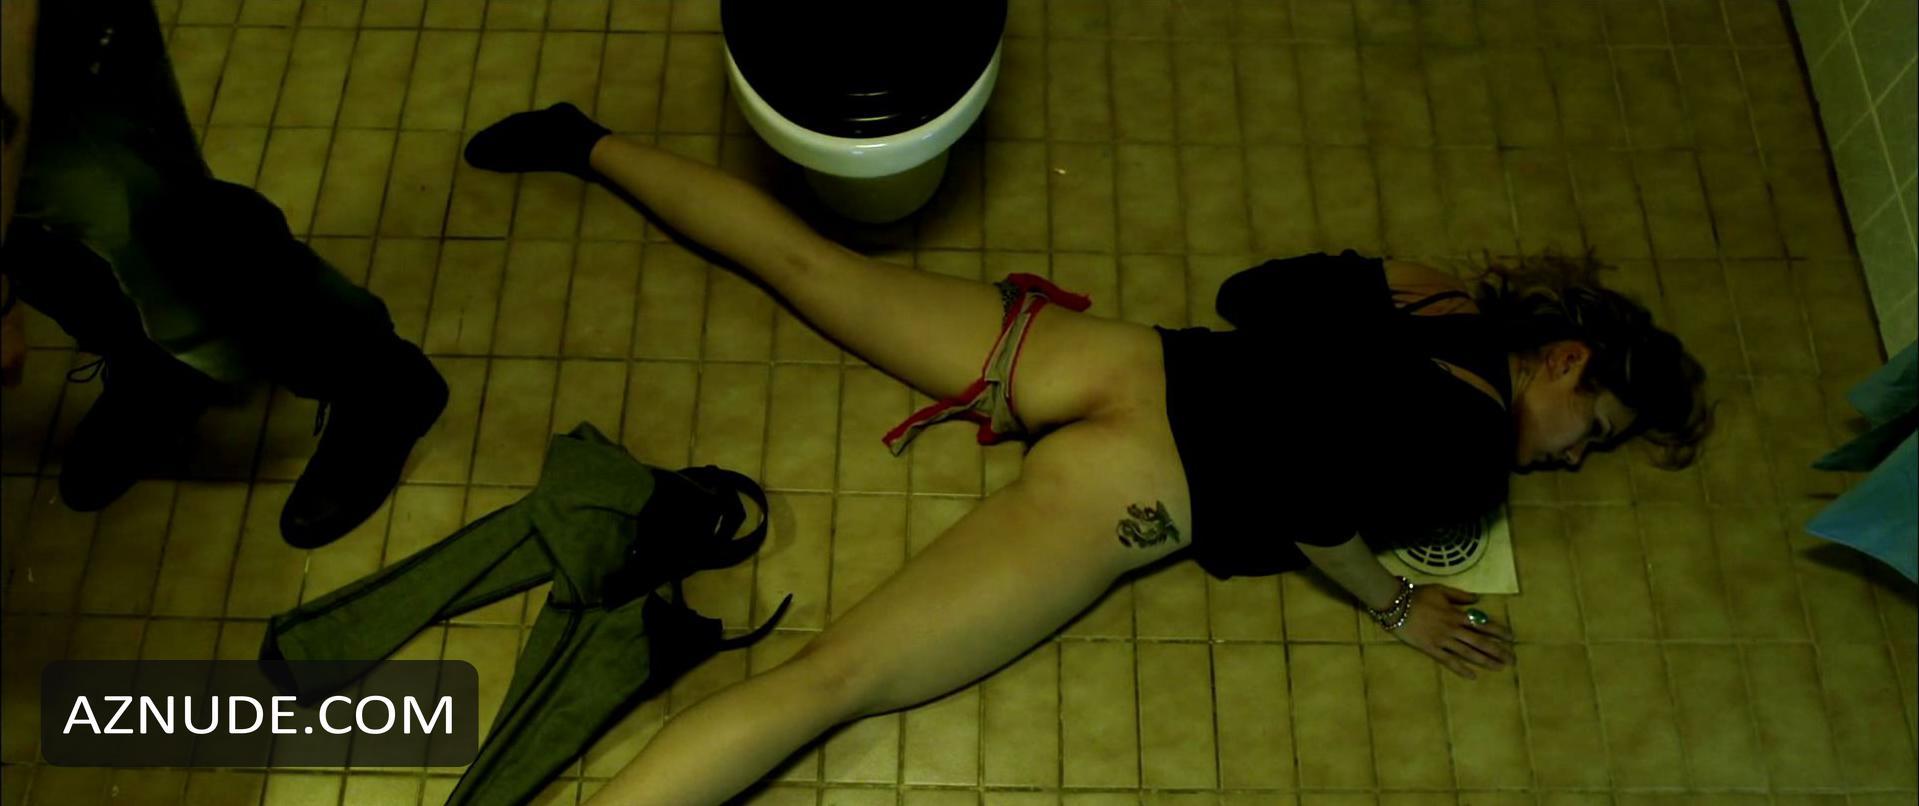 Jessica grabowsky nude